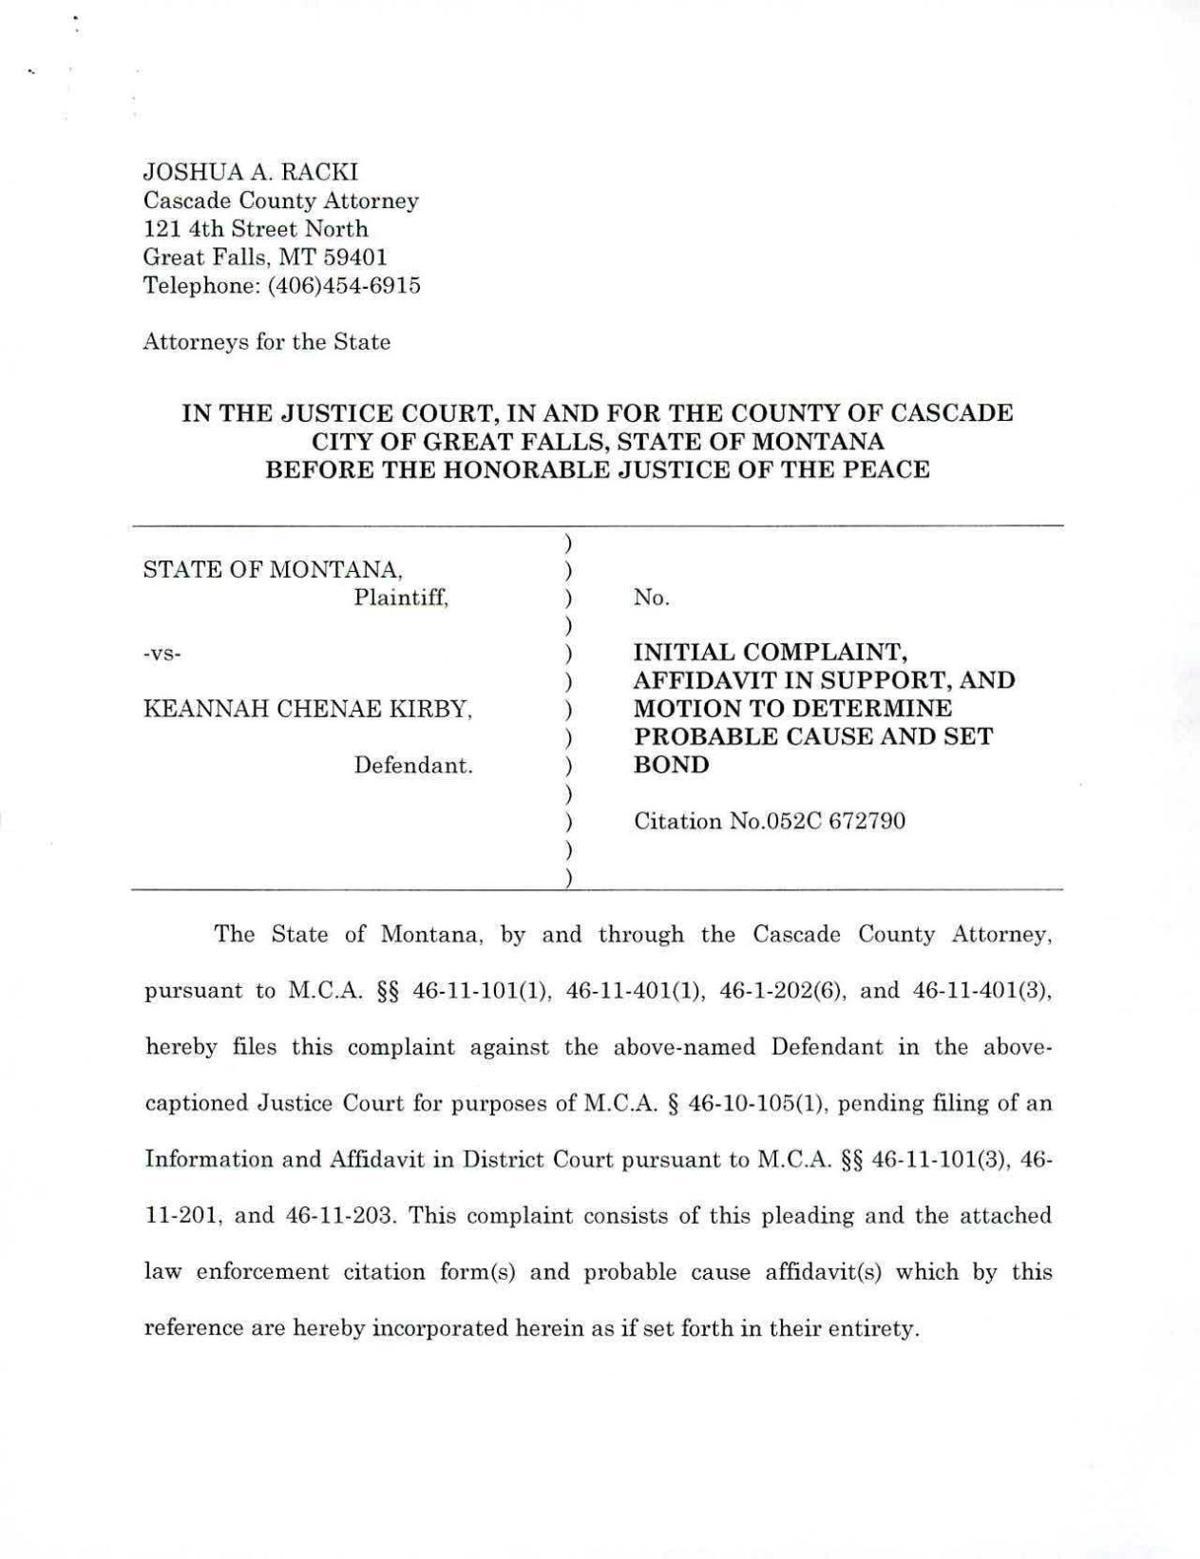 Keannah Chenae Kirby Court Documents